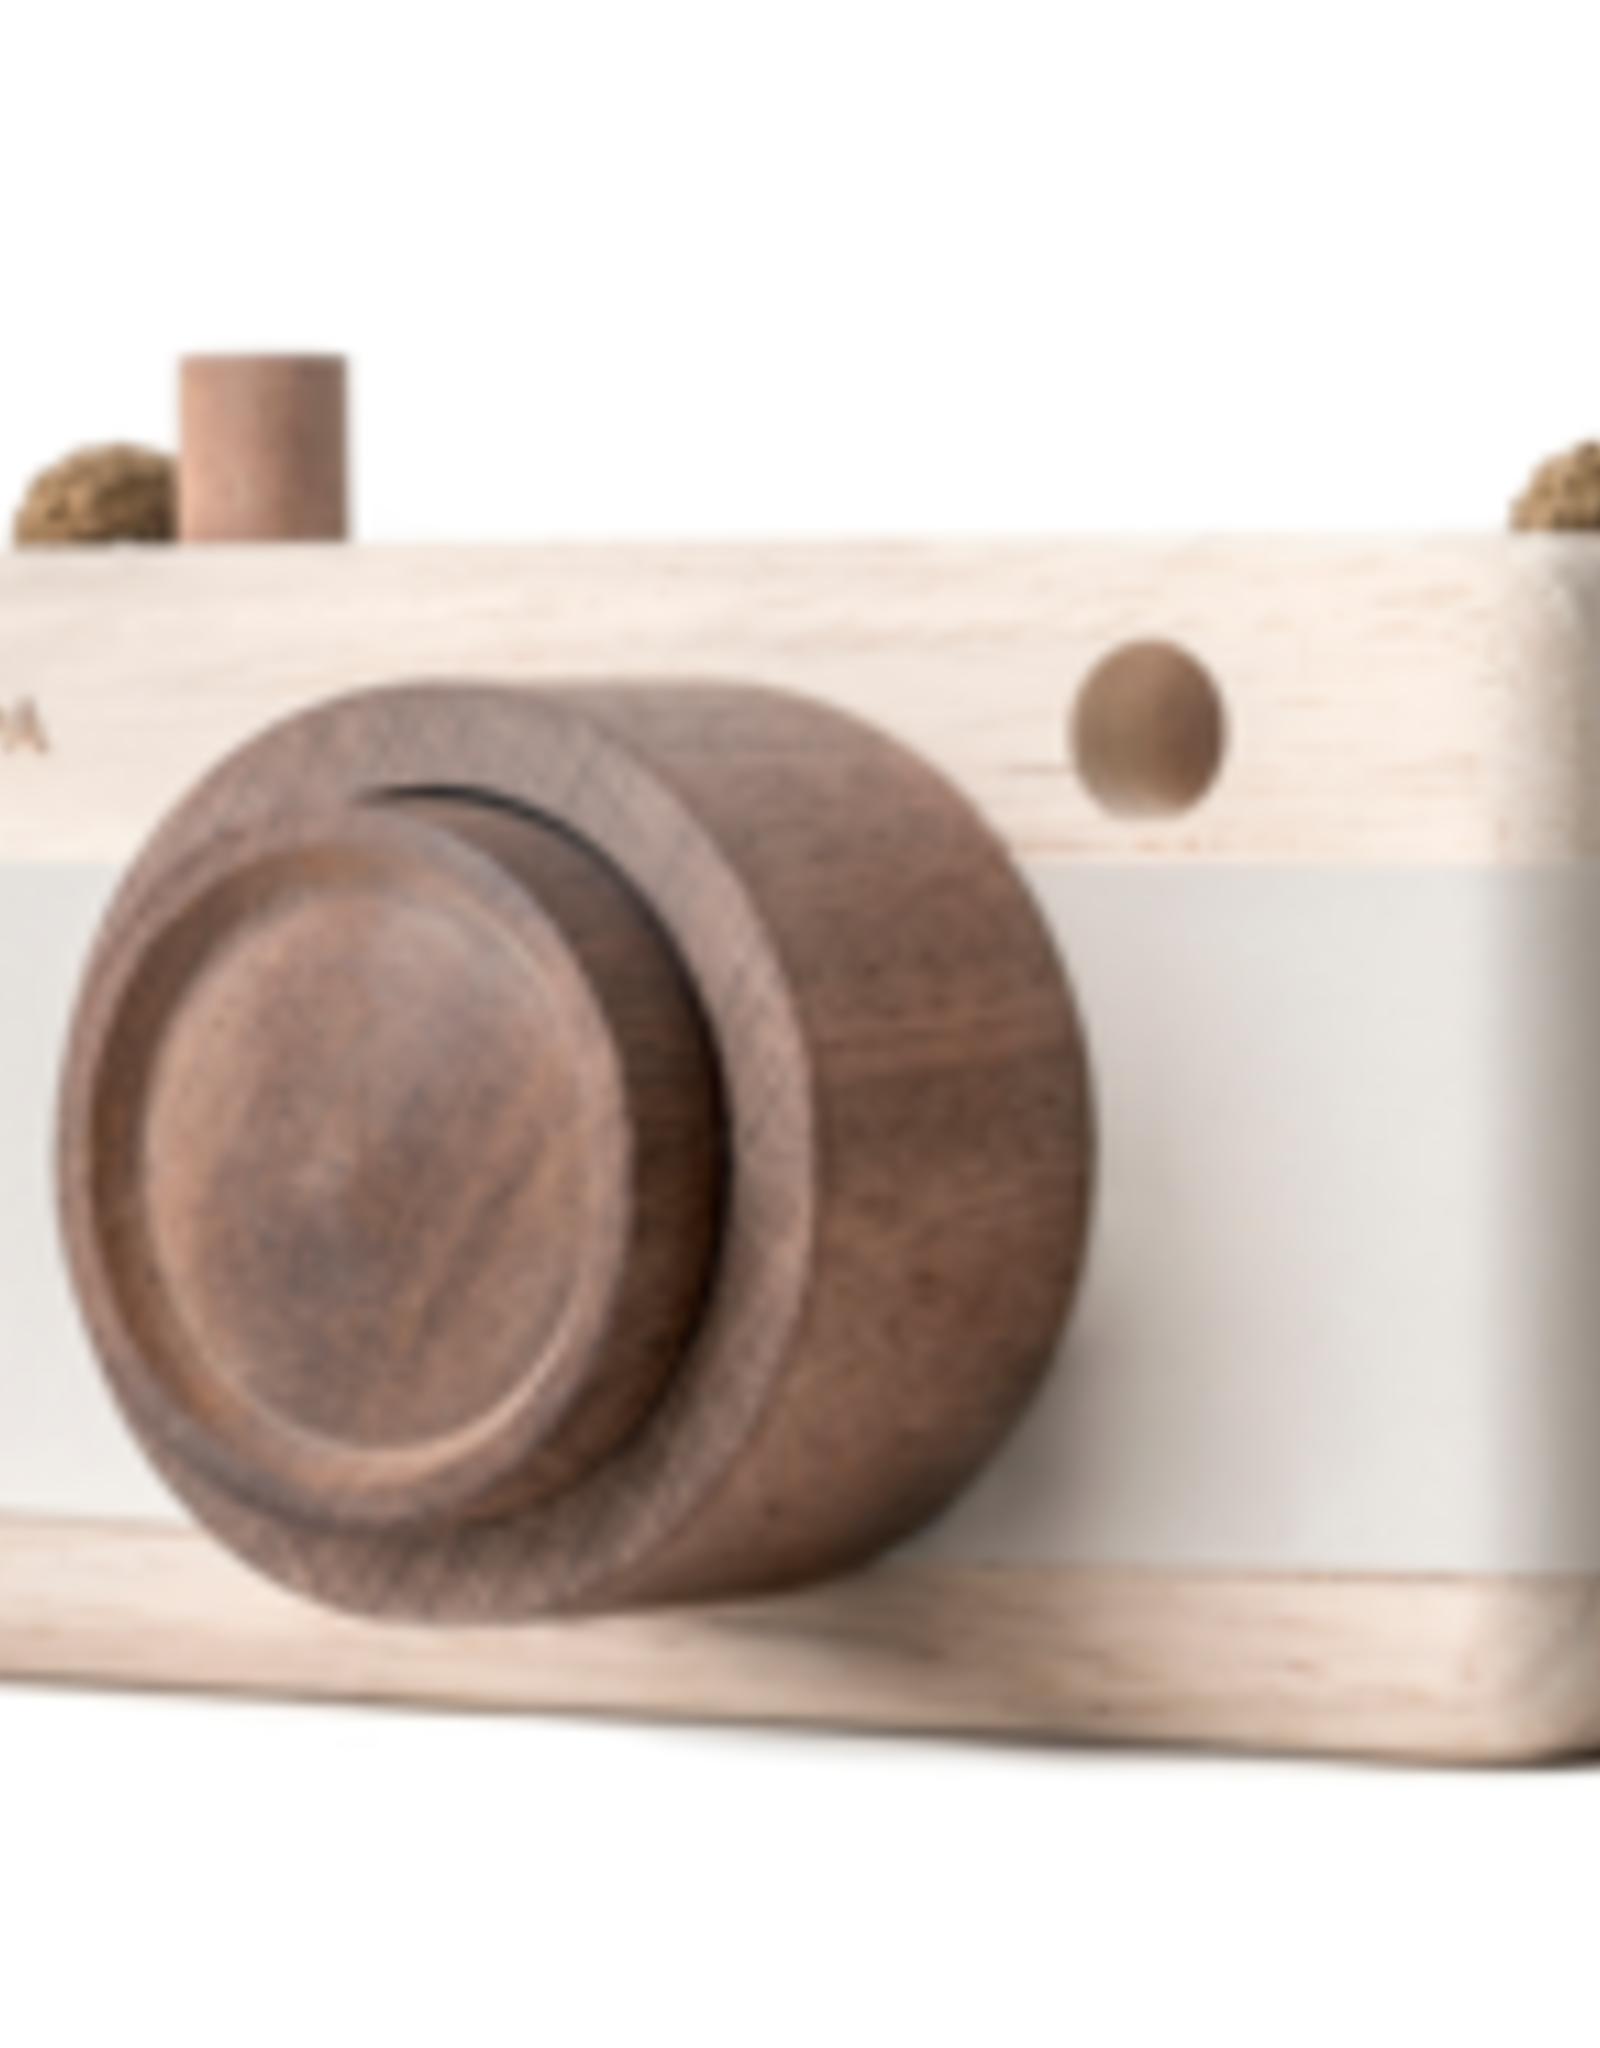 Fanny & Alexander Appareil photo en bois